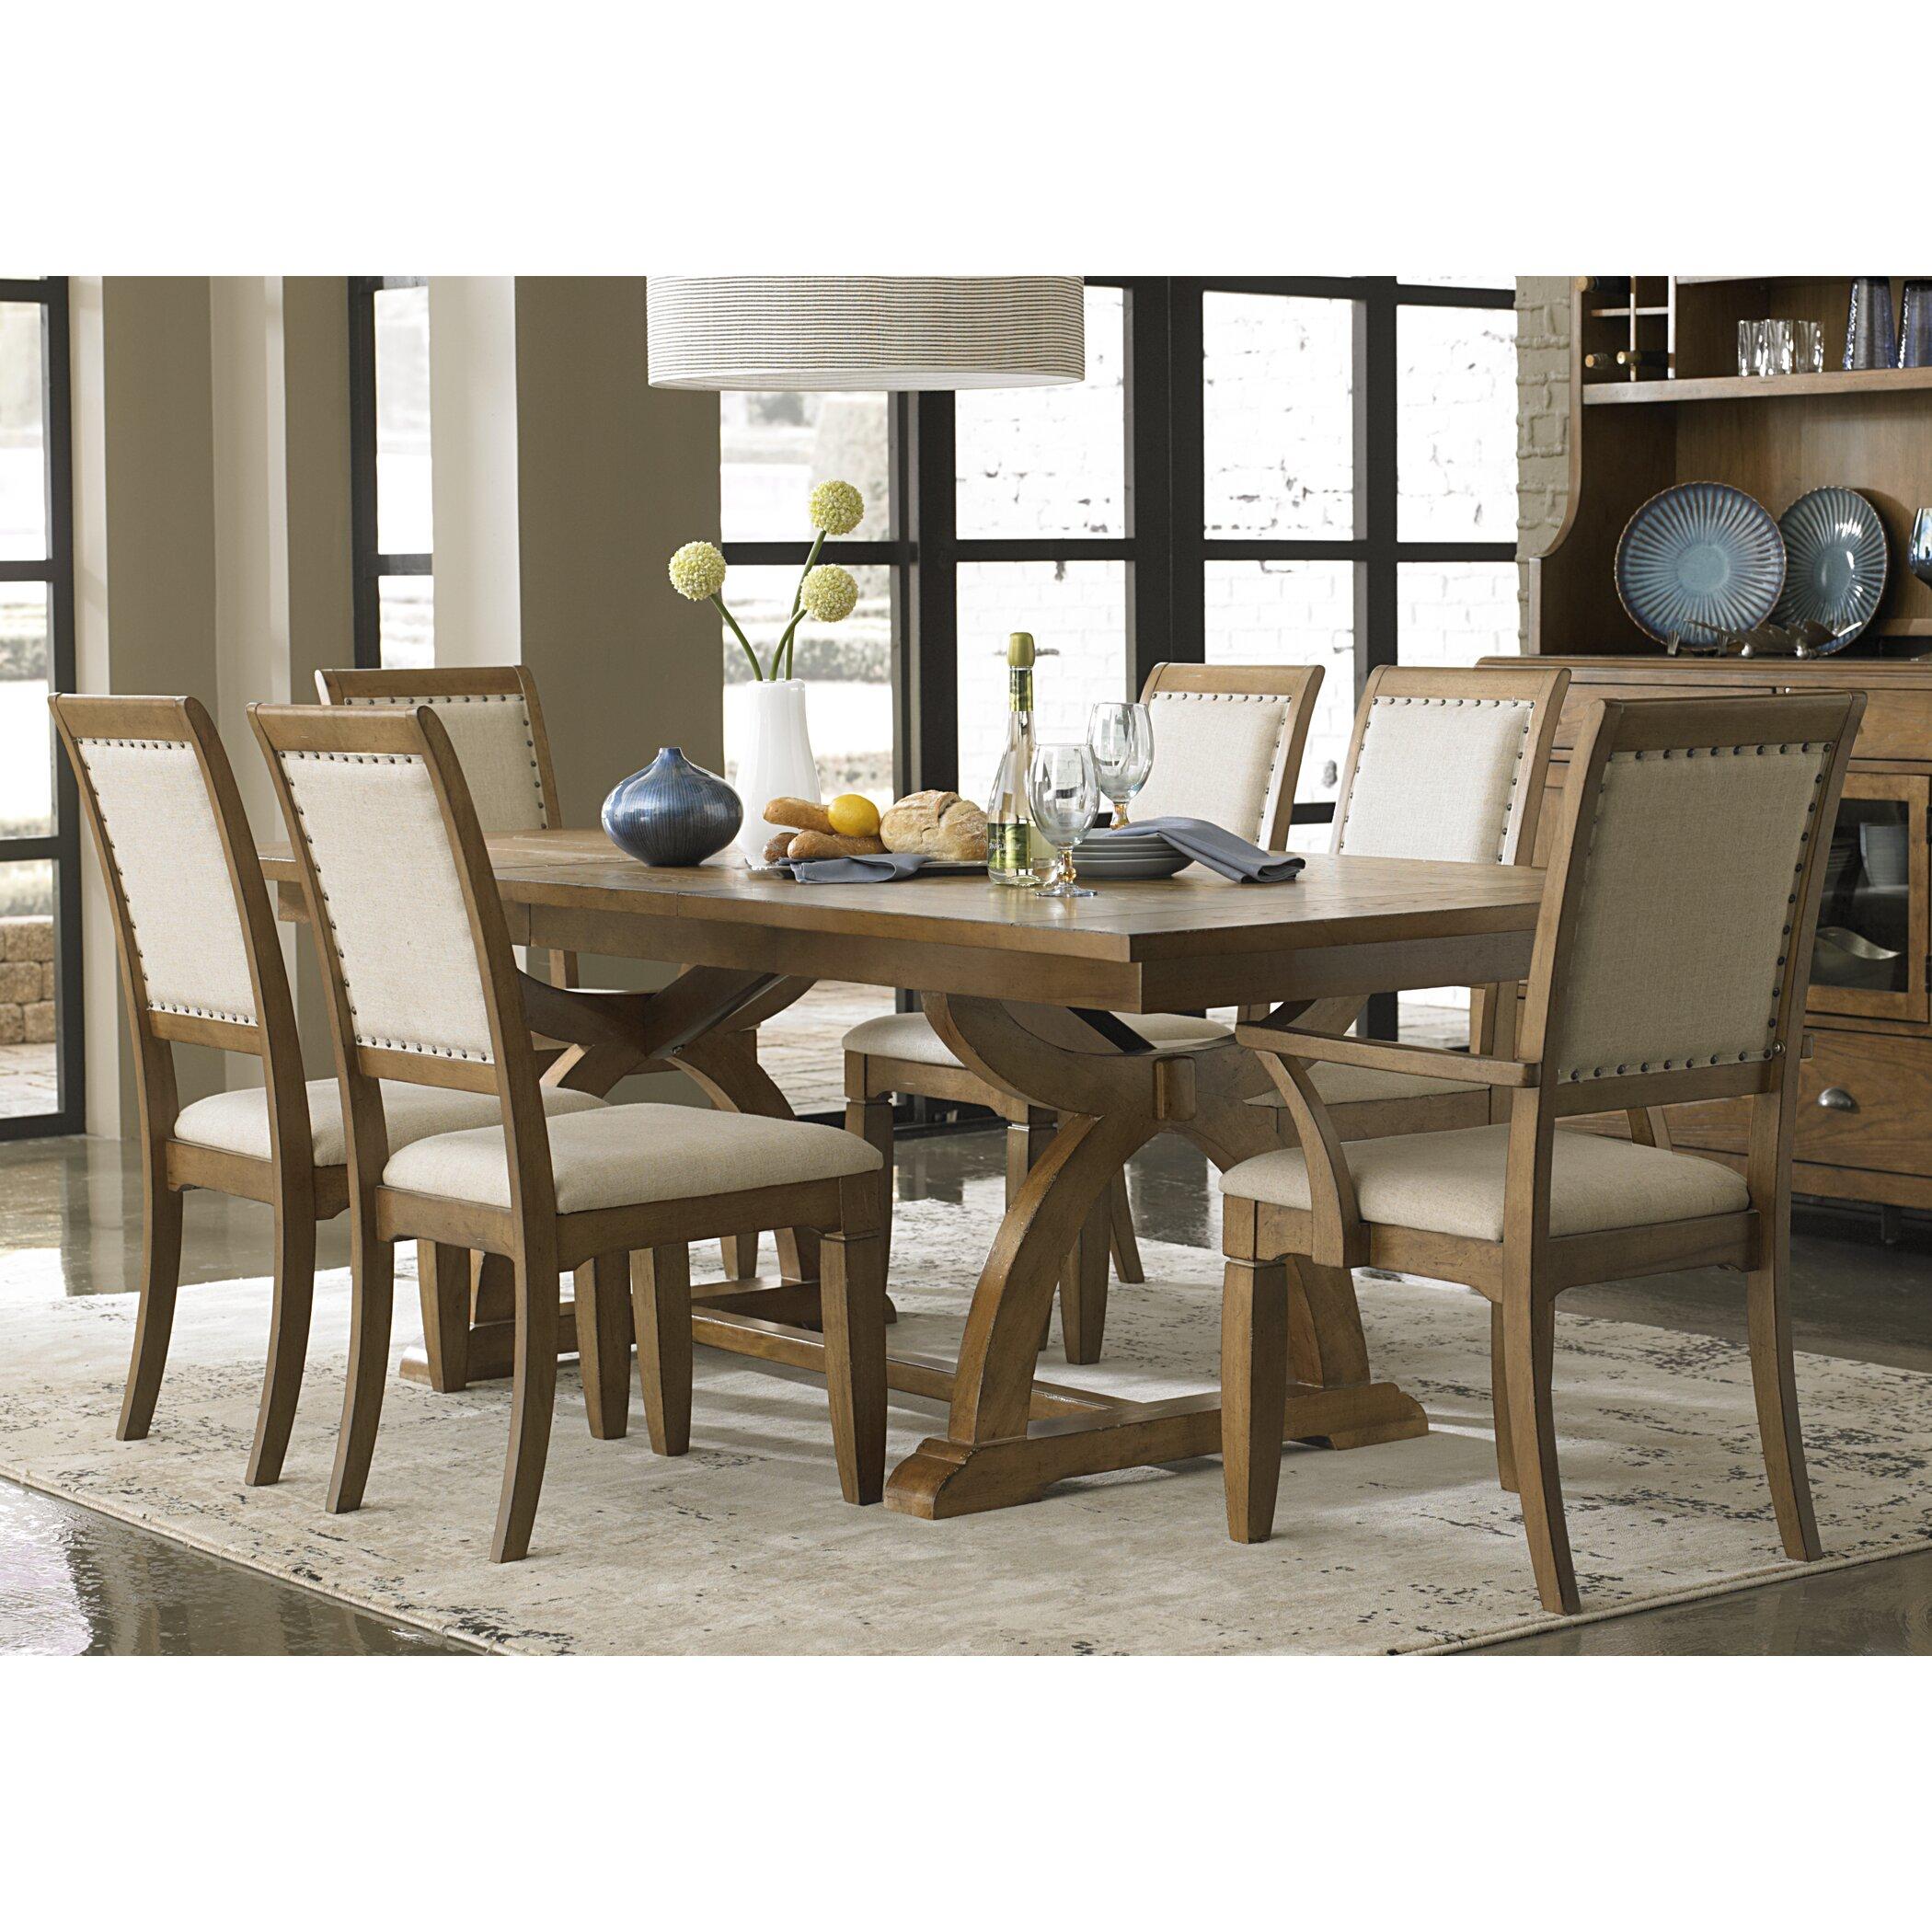 lark manor 9 piece dining set reviews wayfair. Black Bedroom Furniture Sets. Home Design Ideas